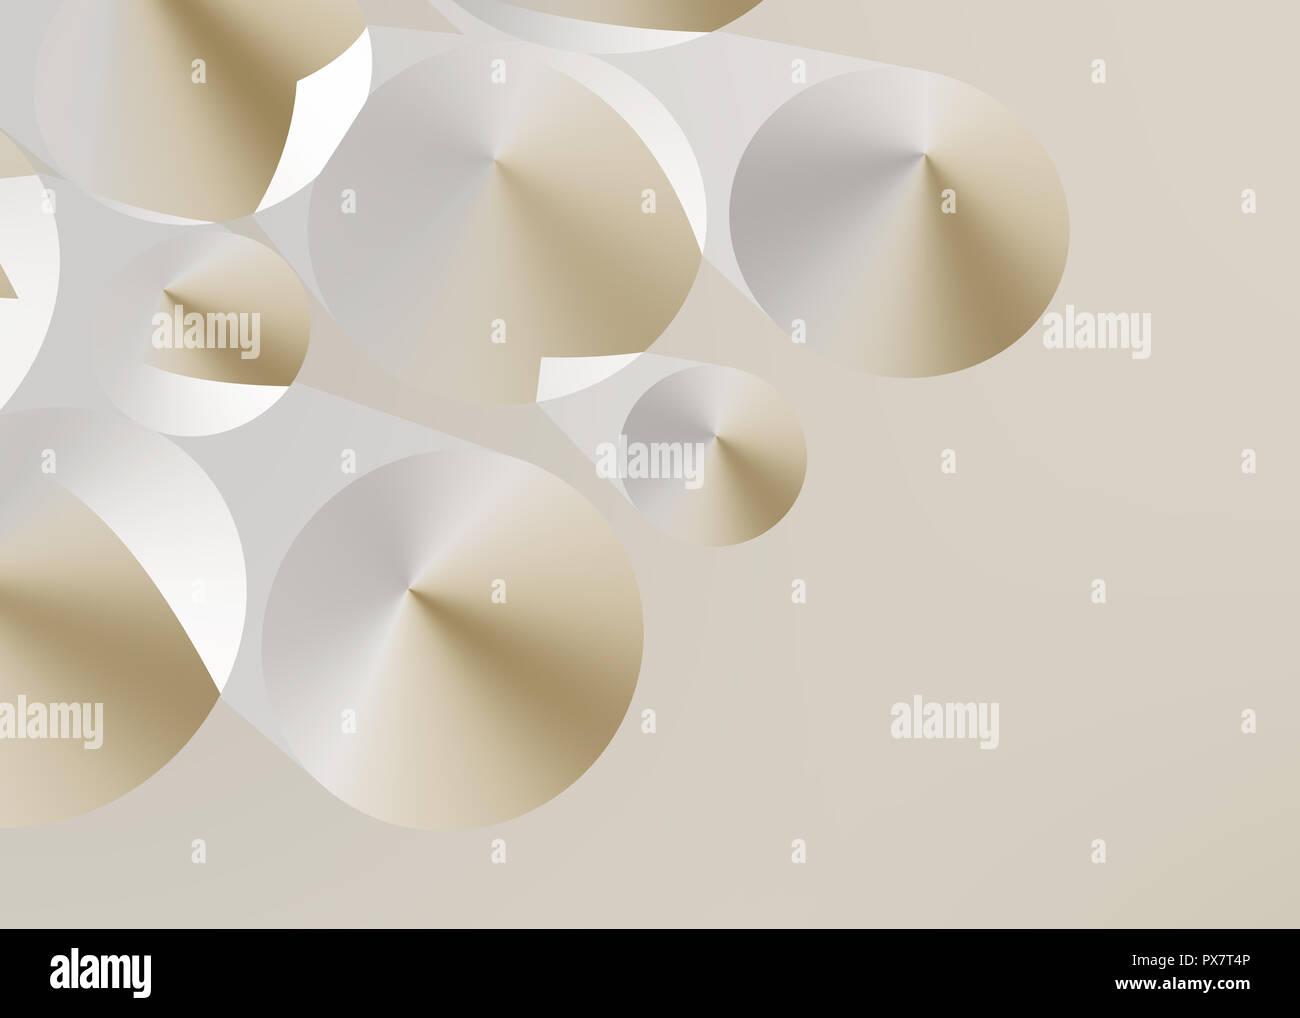 Resumen de fondo cónico, 3D Imagen De Stock